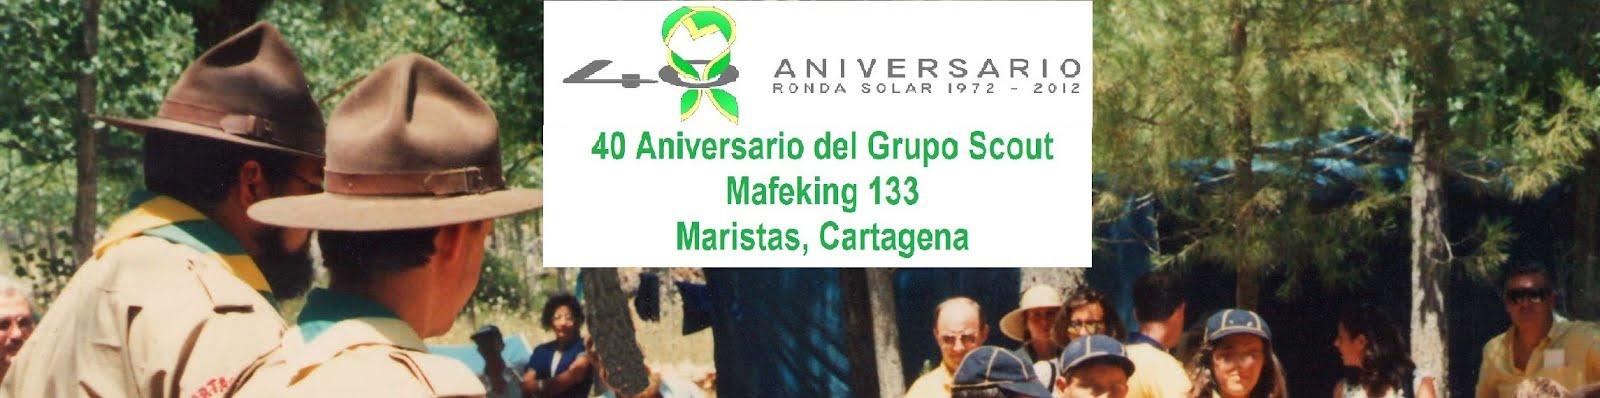 40 aniversario Grupo Scout Mafeking 133, Maristas, Cartagena